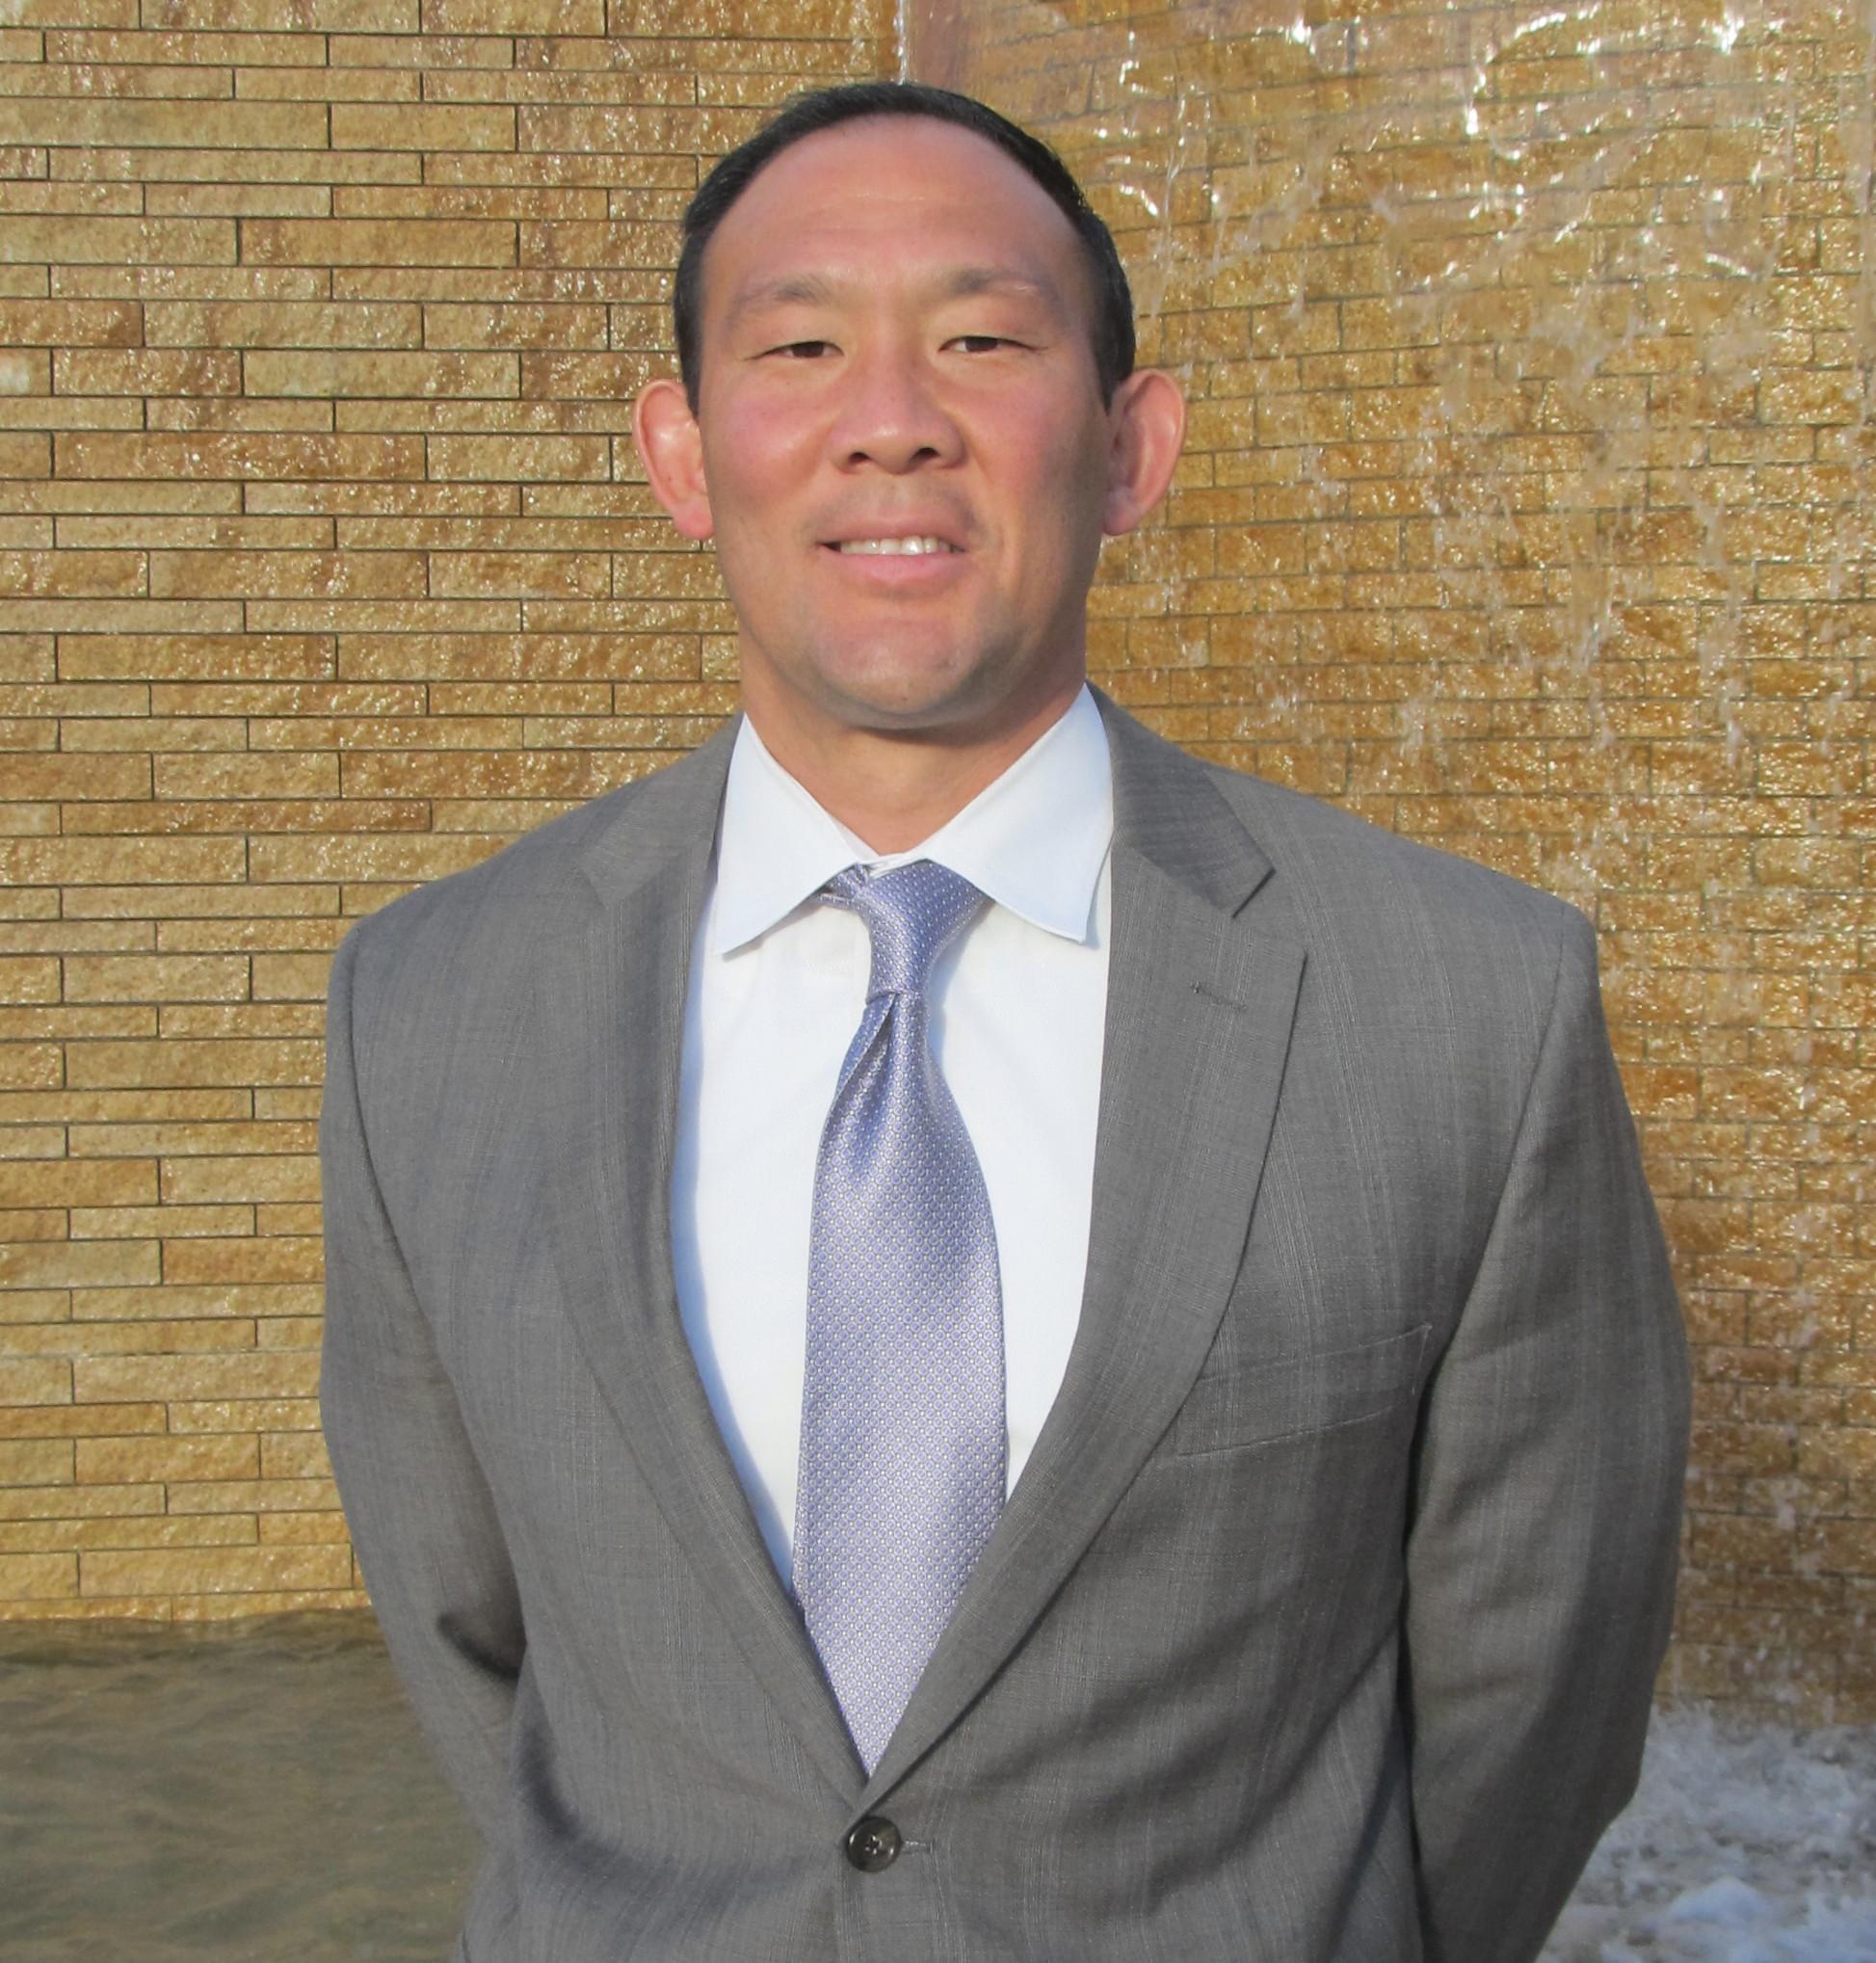 Mas_Morimoto-Clayton_resident-attorney_(2).JPG